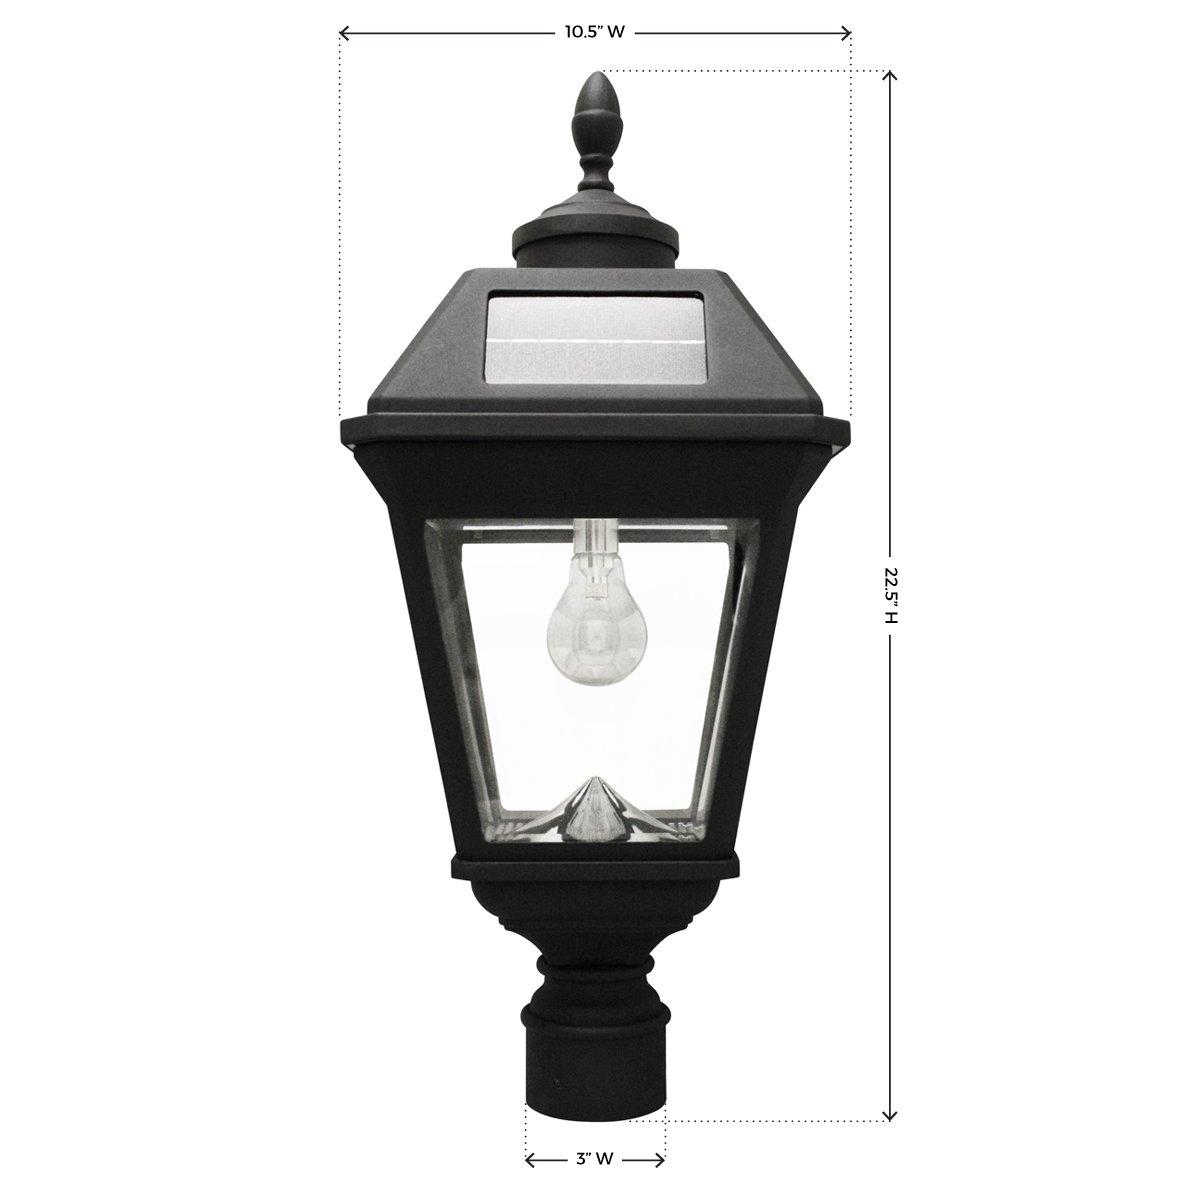 "Gama Sonic GS-97B-F Imperial GS Solar Light Bulb-3"" Fitter Mount, Black"